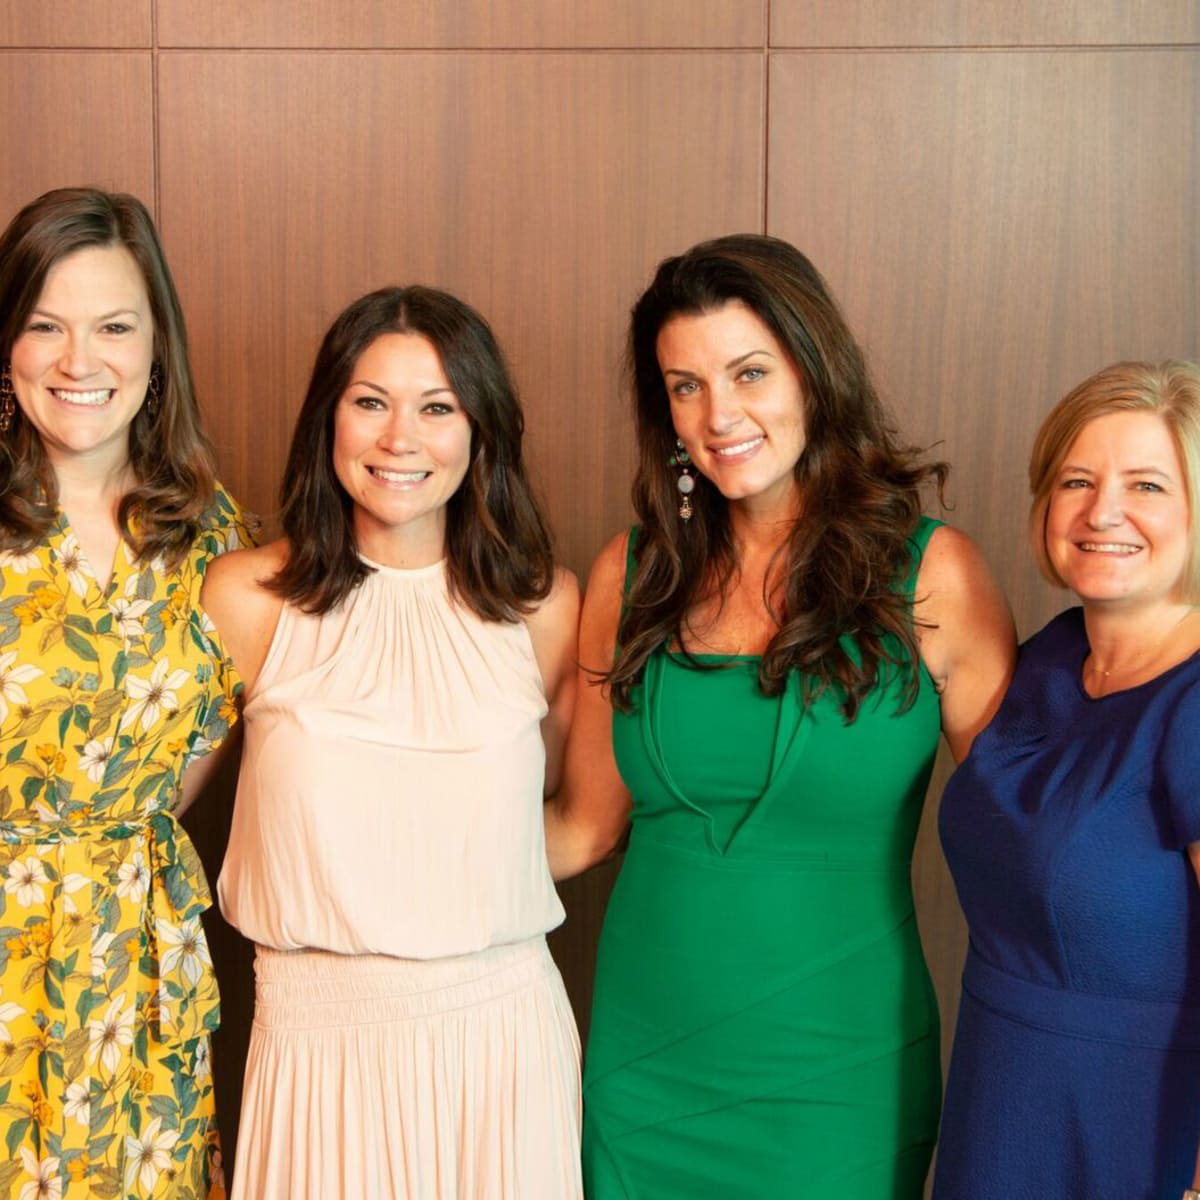 Houston CanCare Survivors Luncheon Jennifer  Doherty,  Megan  Vondra,  Jordan Seff Cristina  Vetrano